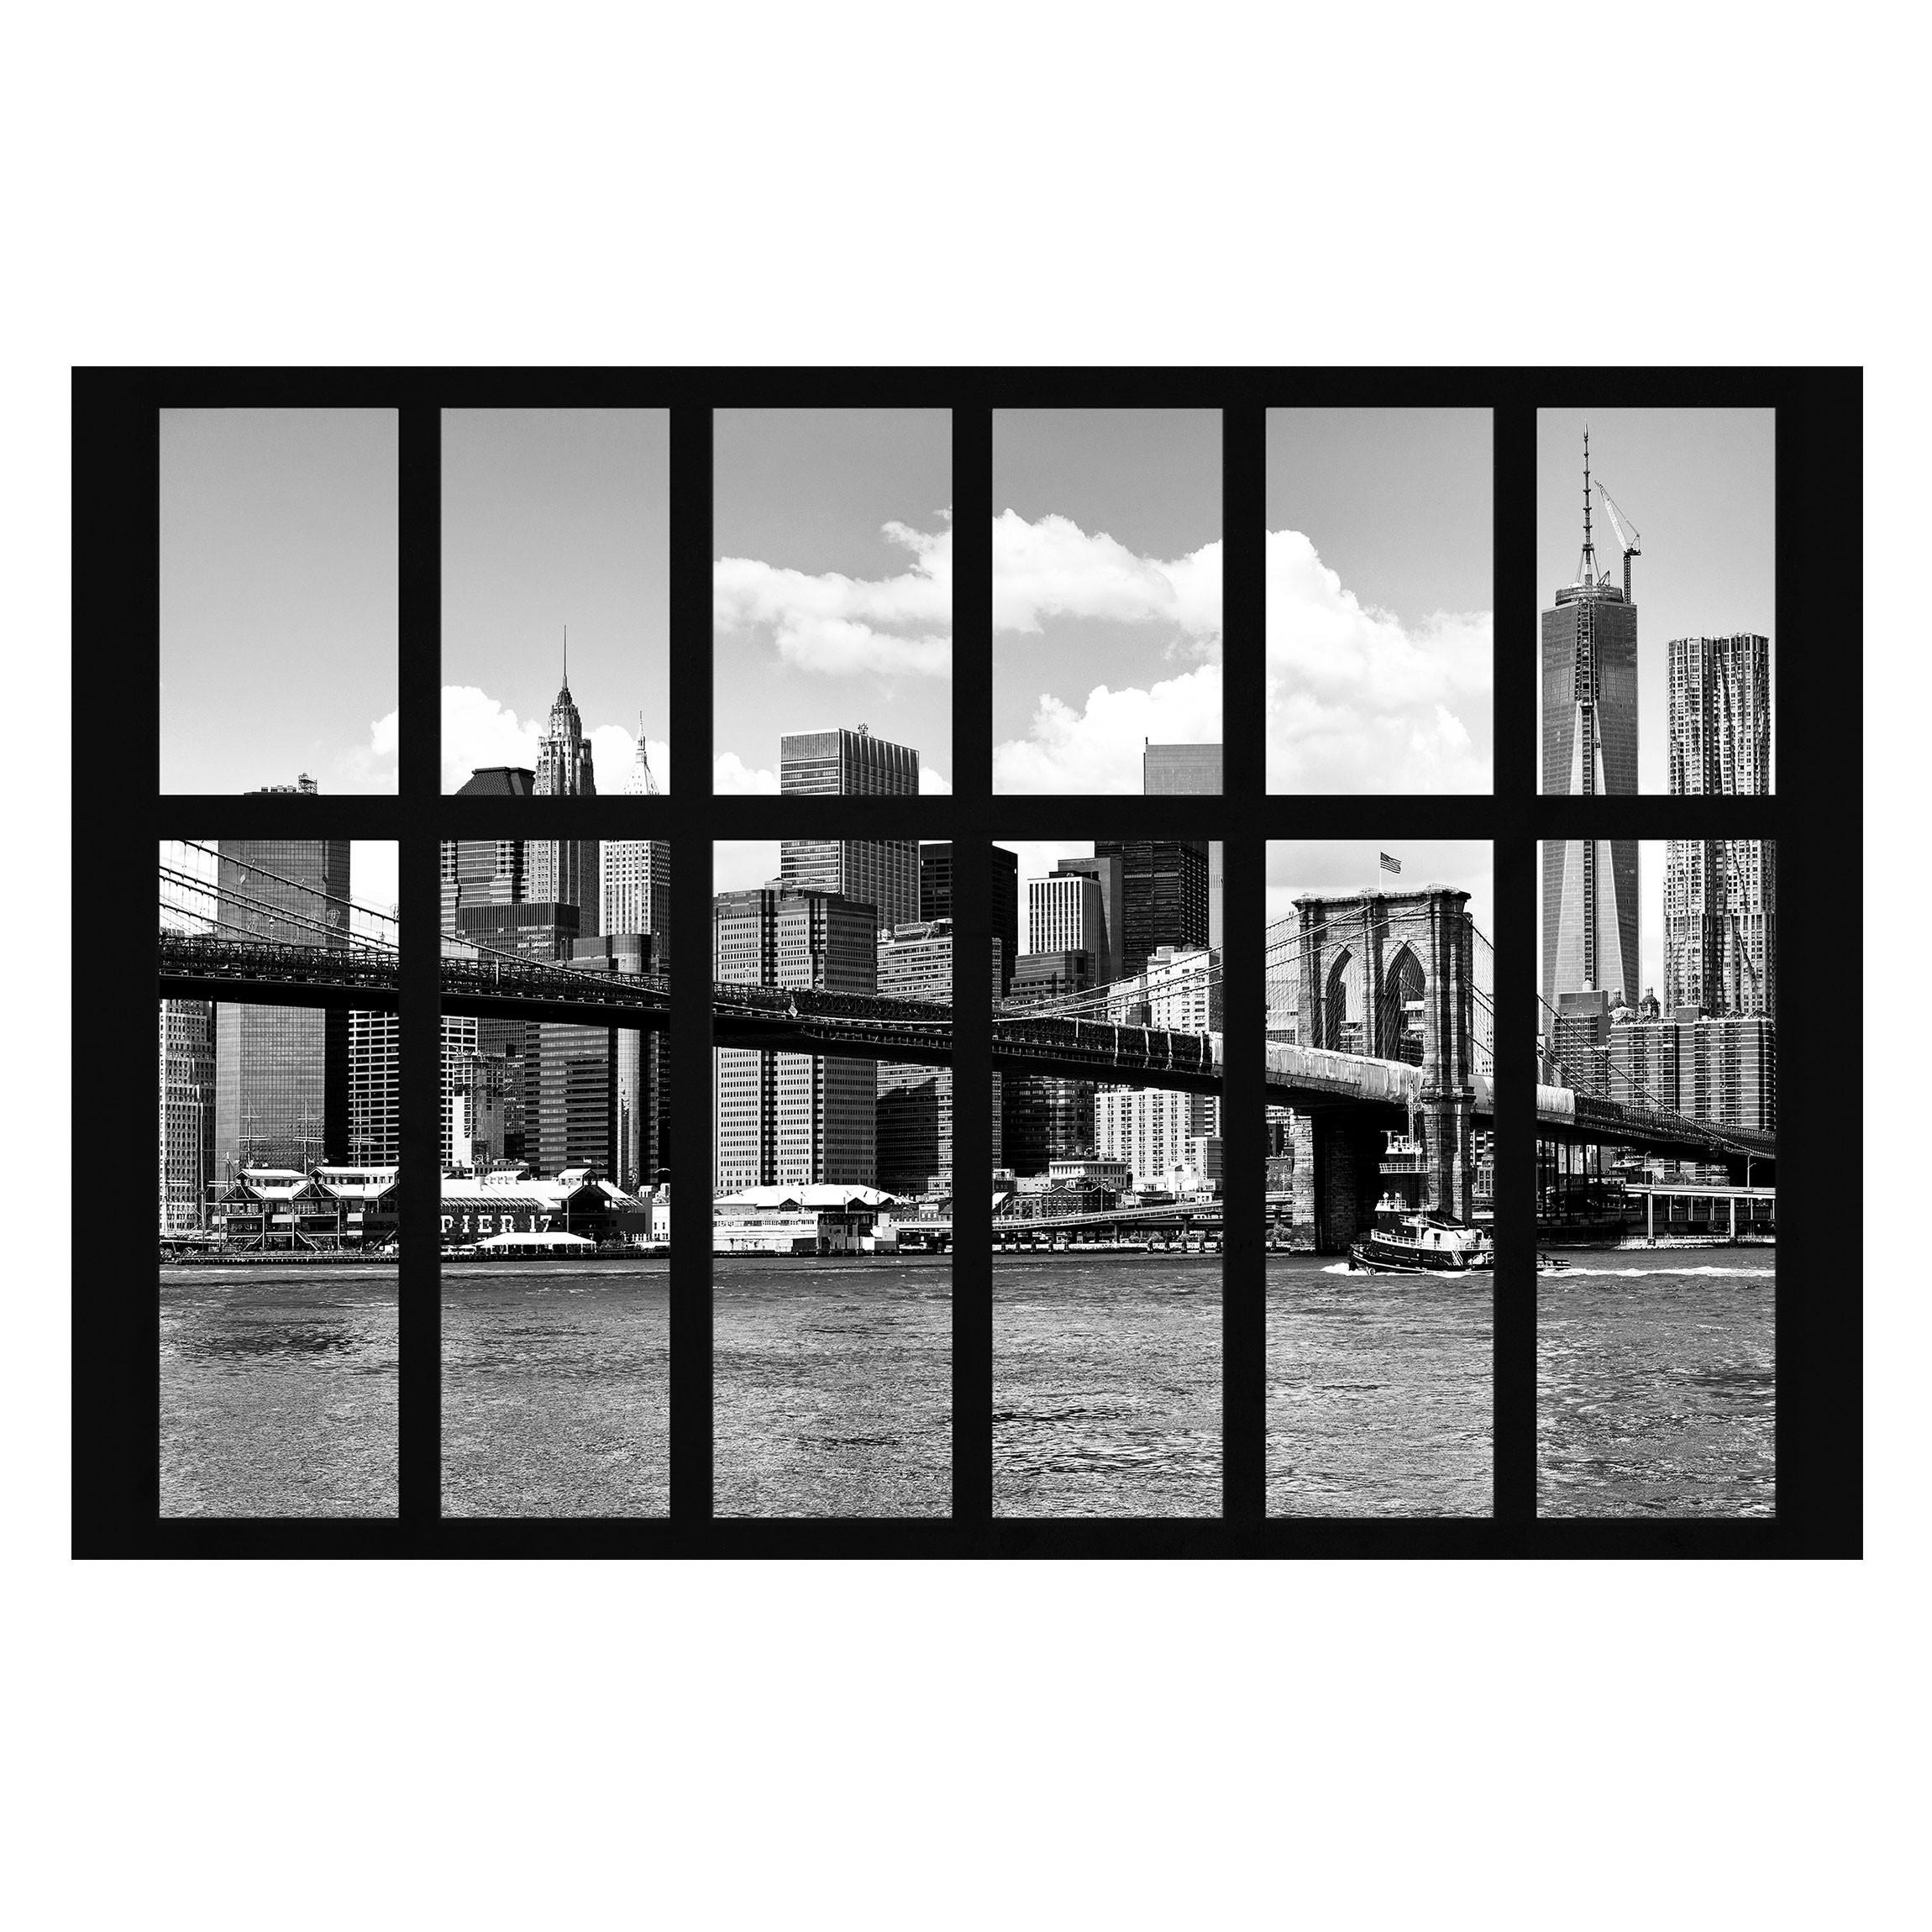 new york fototapete selbstklebend fenster new york brooklyn bridge ii. Black Bedroom Furniture Sets. Home Design Ideas